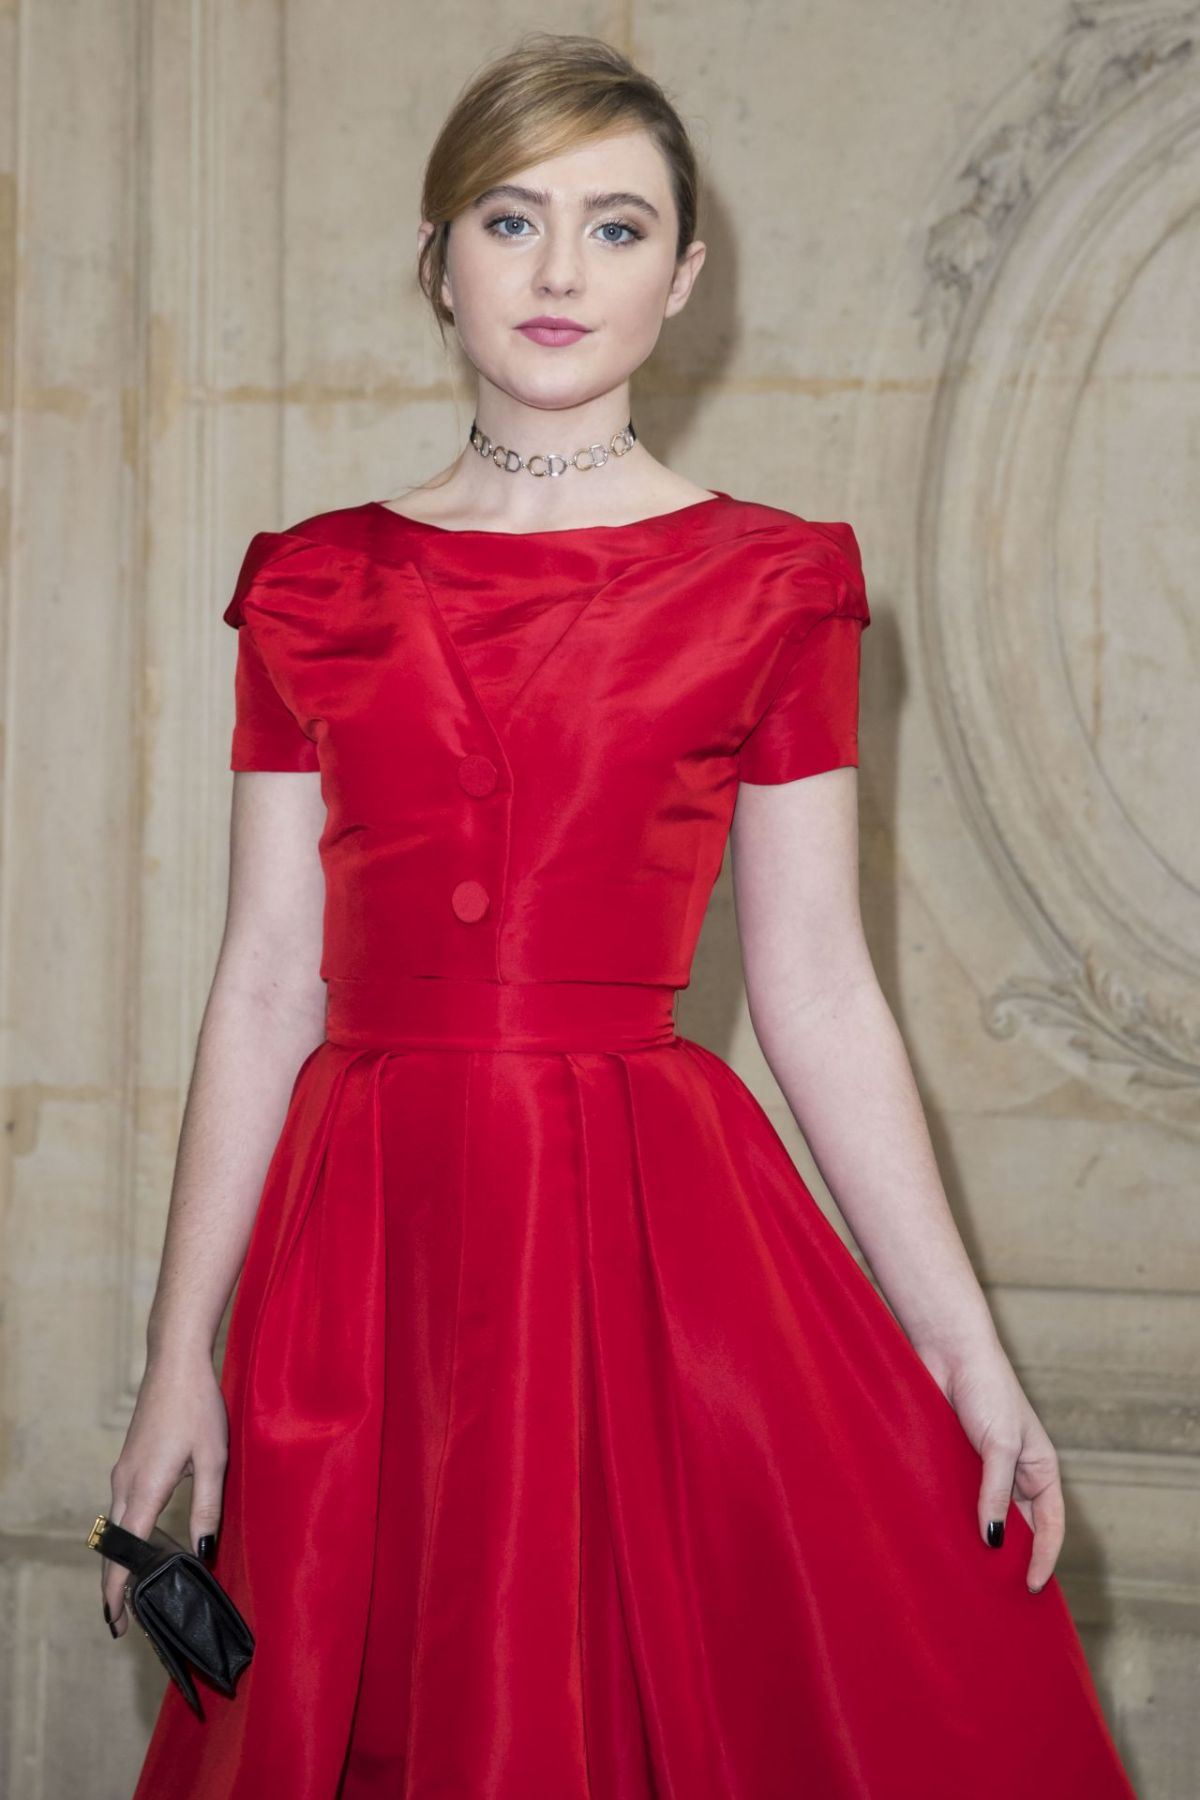 KATHRYN NEWTON at Christian Dior Fashion Show at Paris Fashion Week 03/03/2017